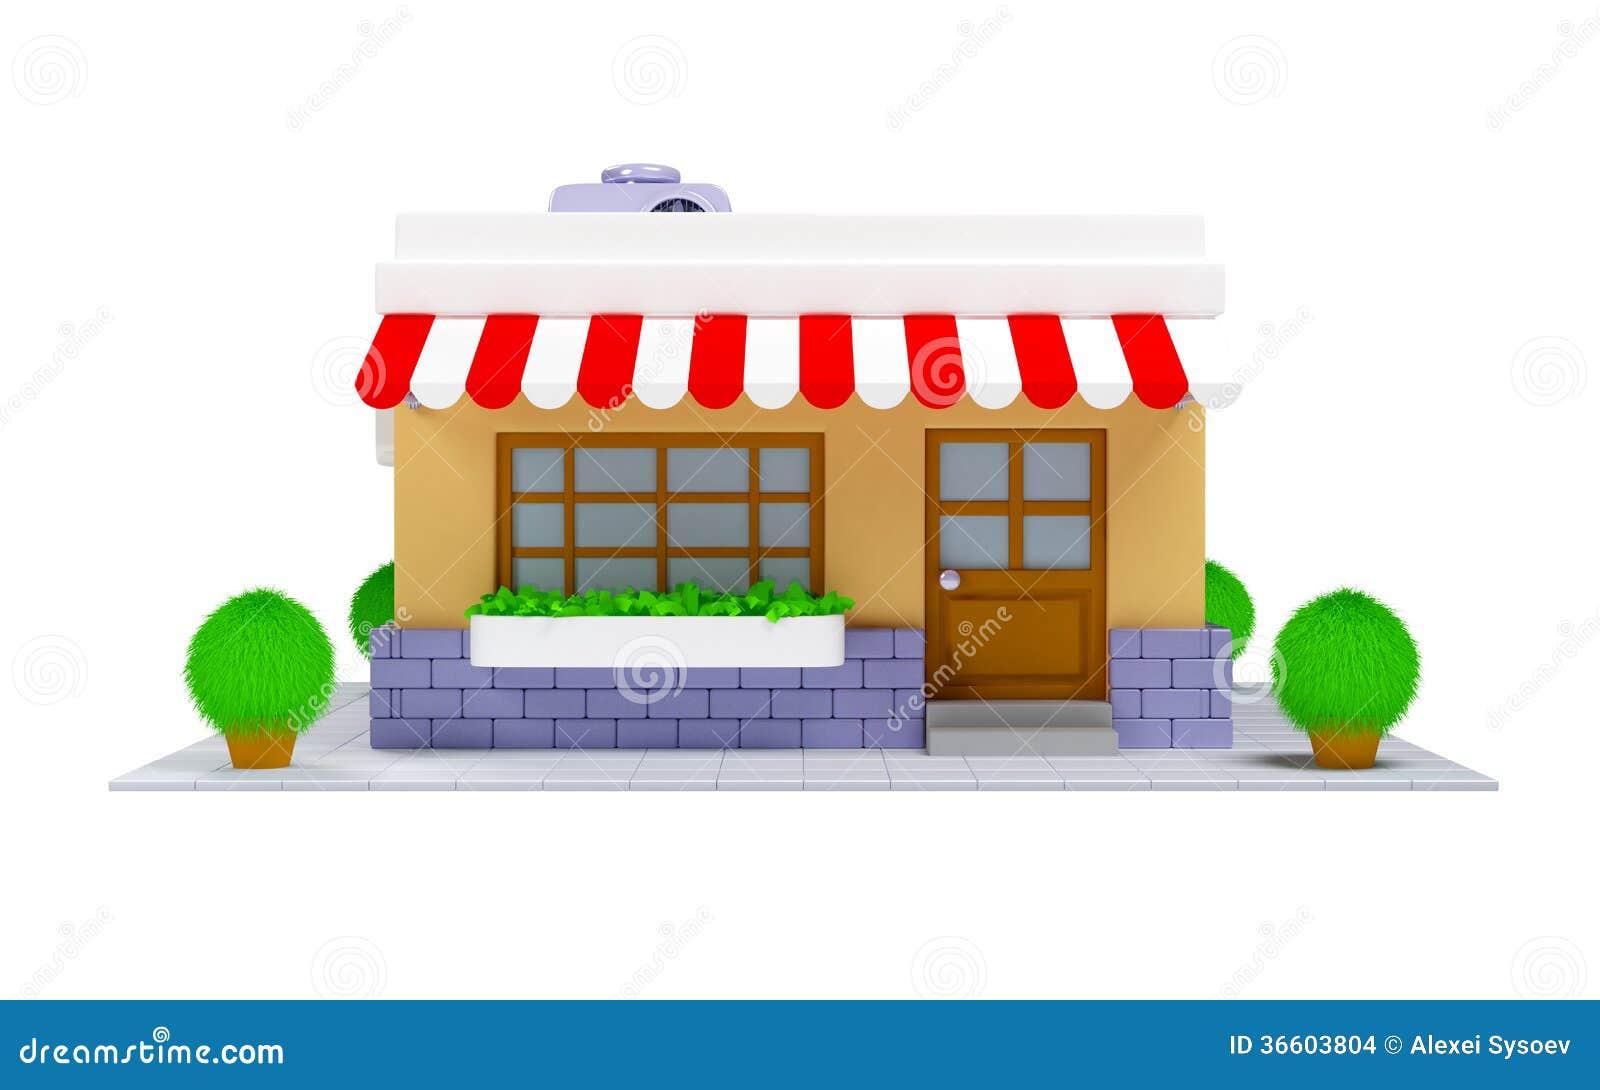 3d shop icon stock images image 36603804 for 3d house builder online